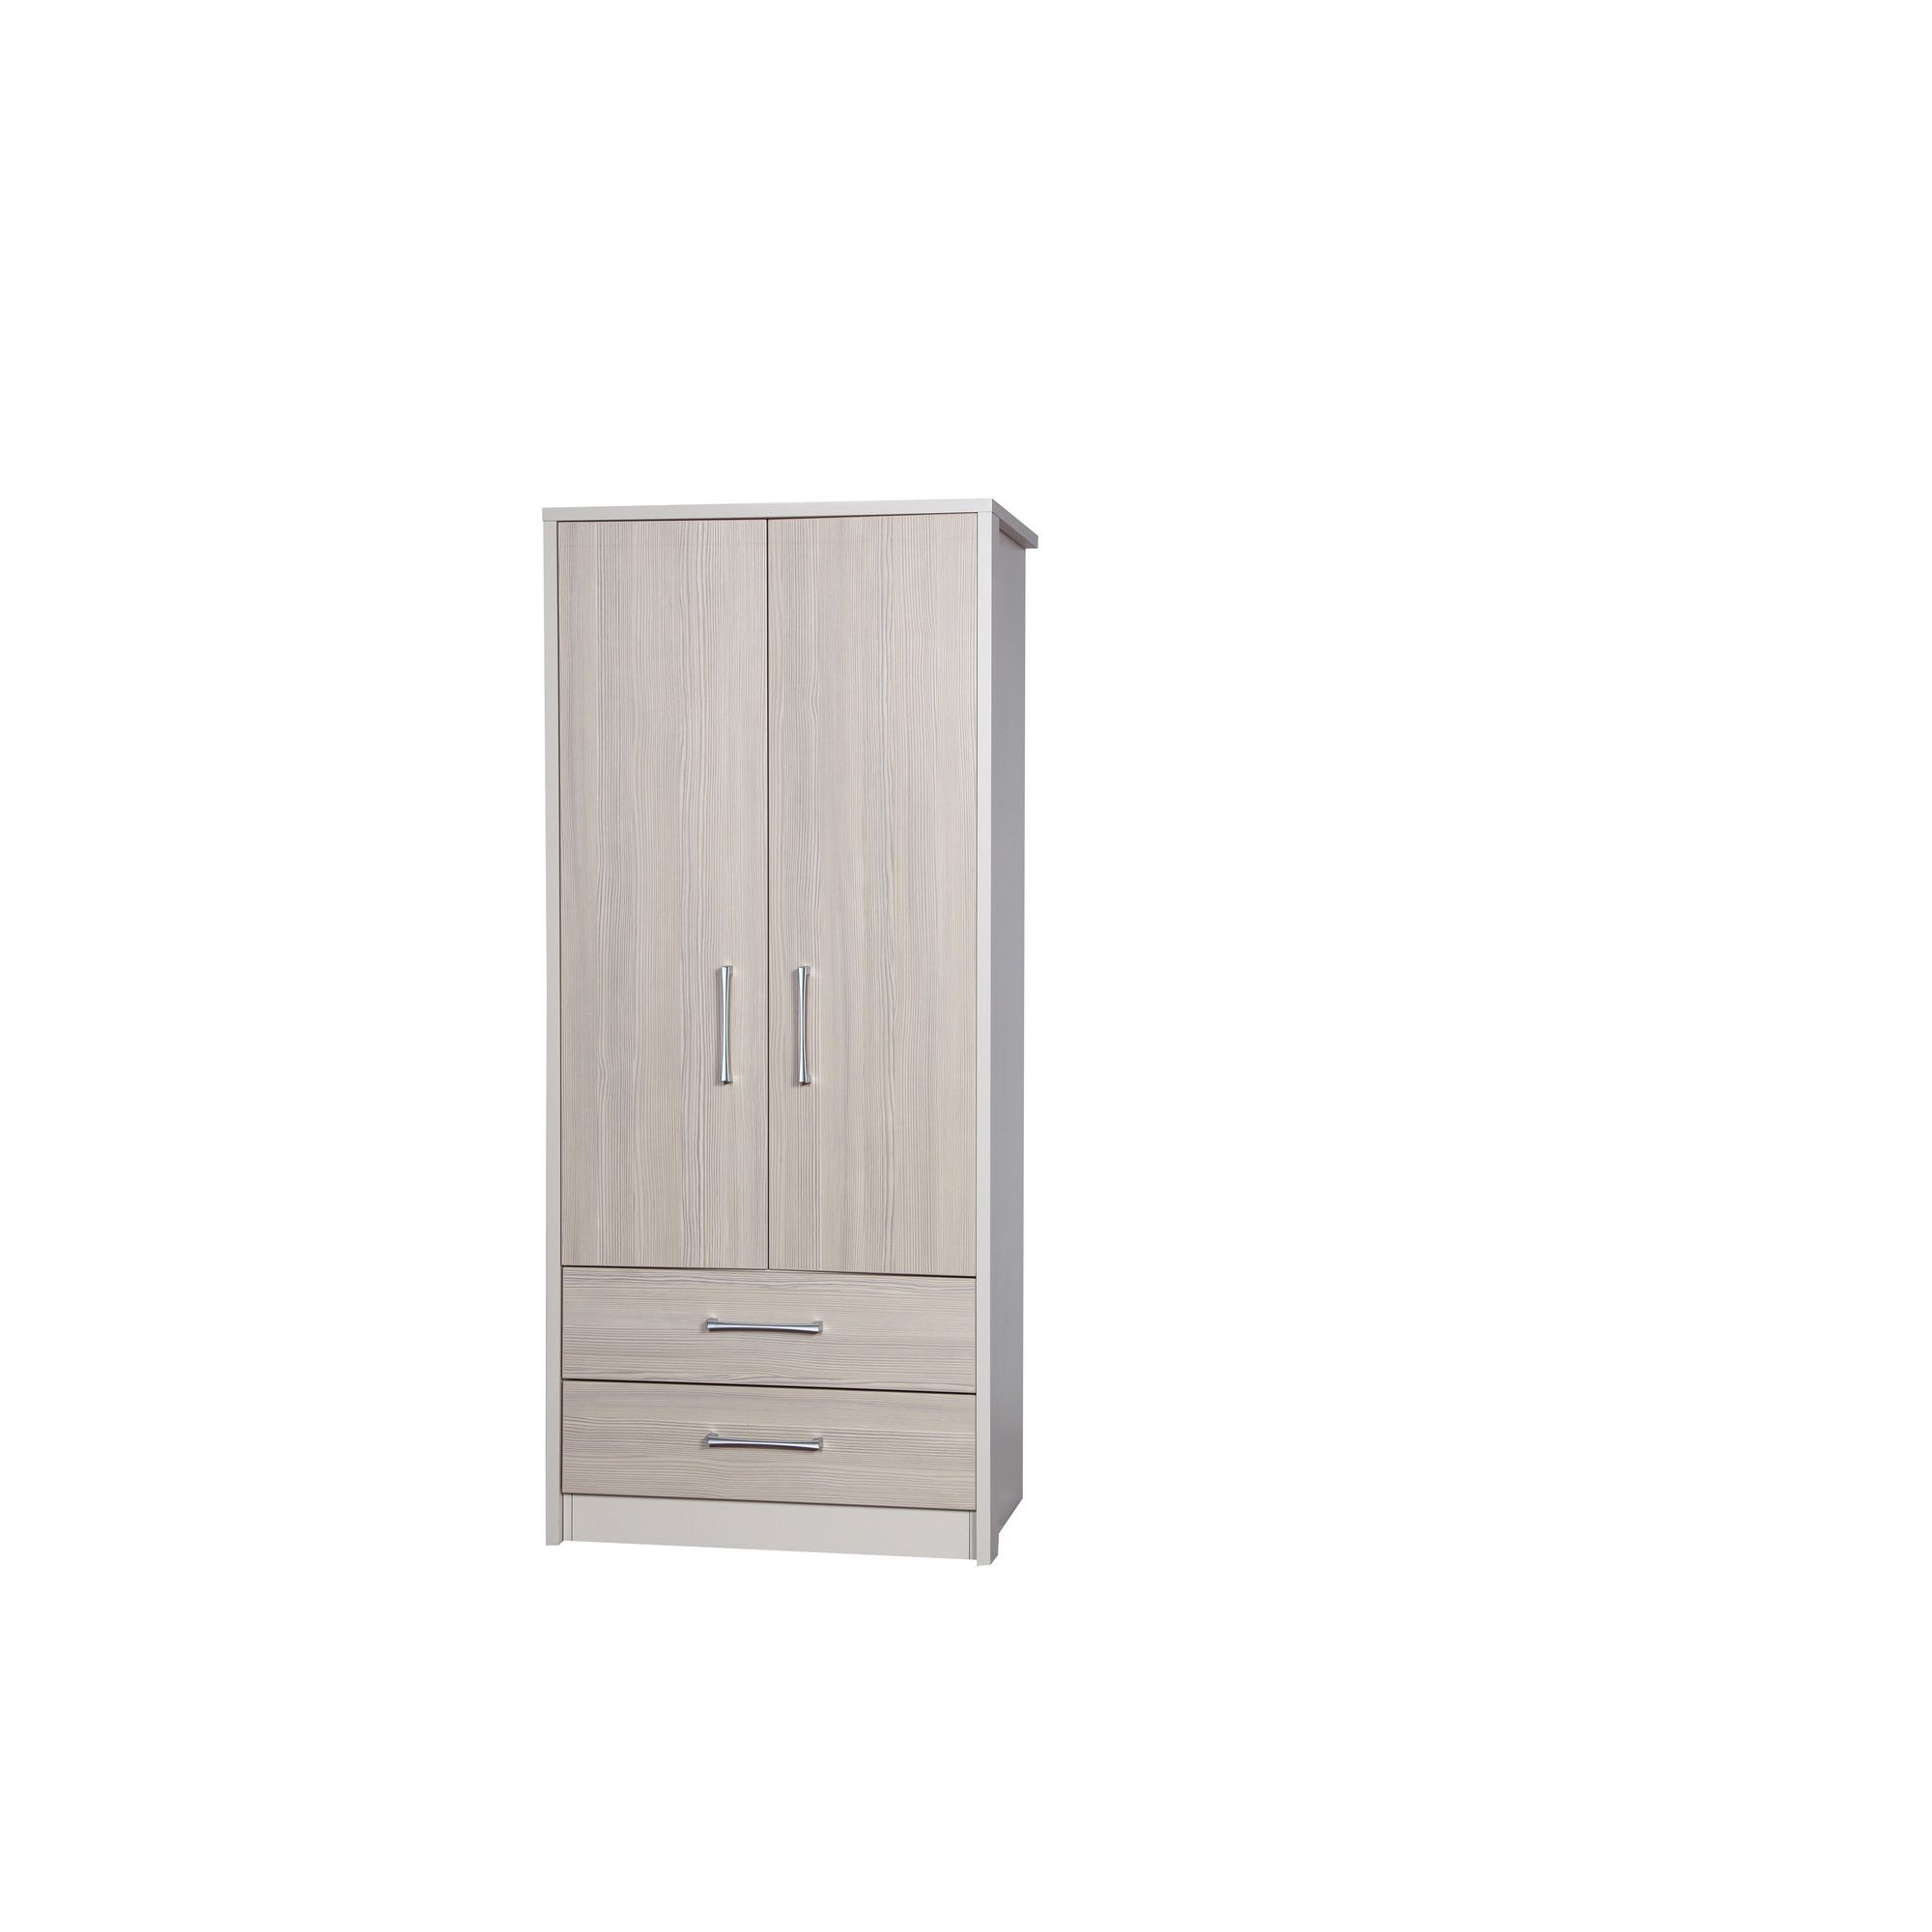 Alto Furniture Avola 2 Drawer Combi Wardrobe - Cream Carcass With Champagne Avola at Tesco Direct